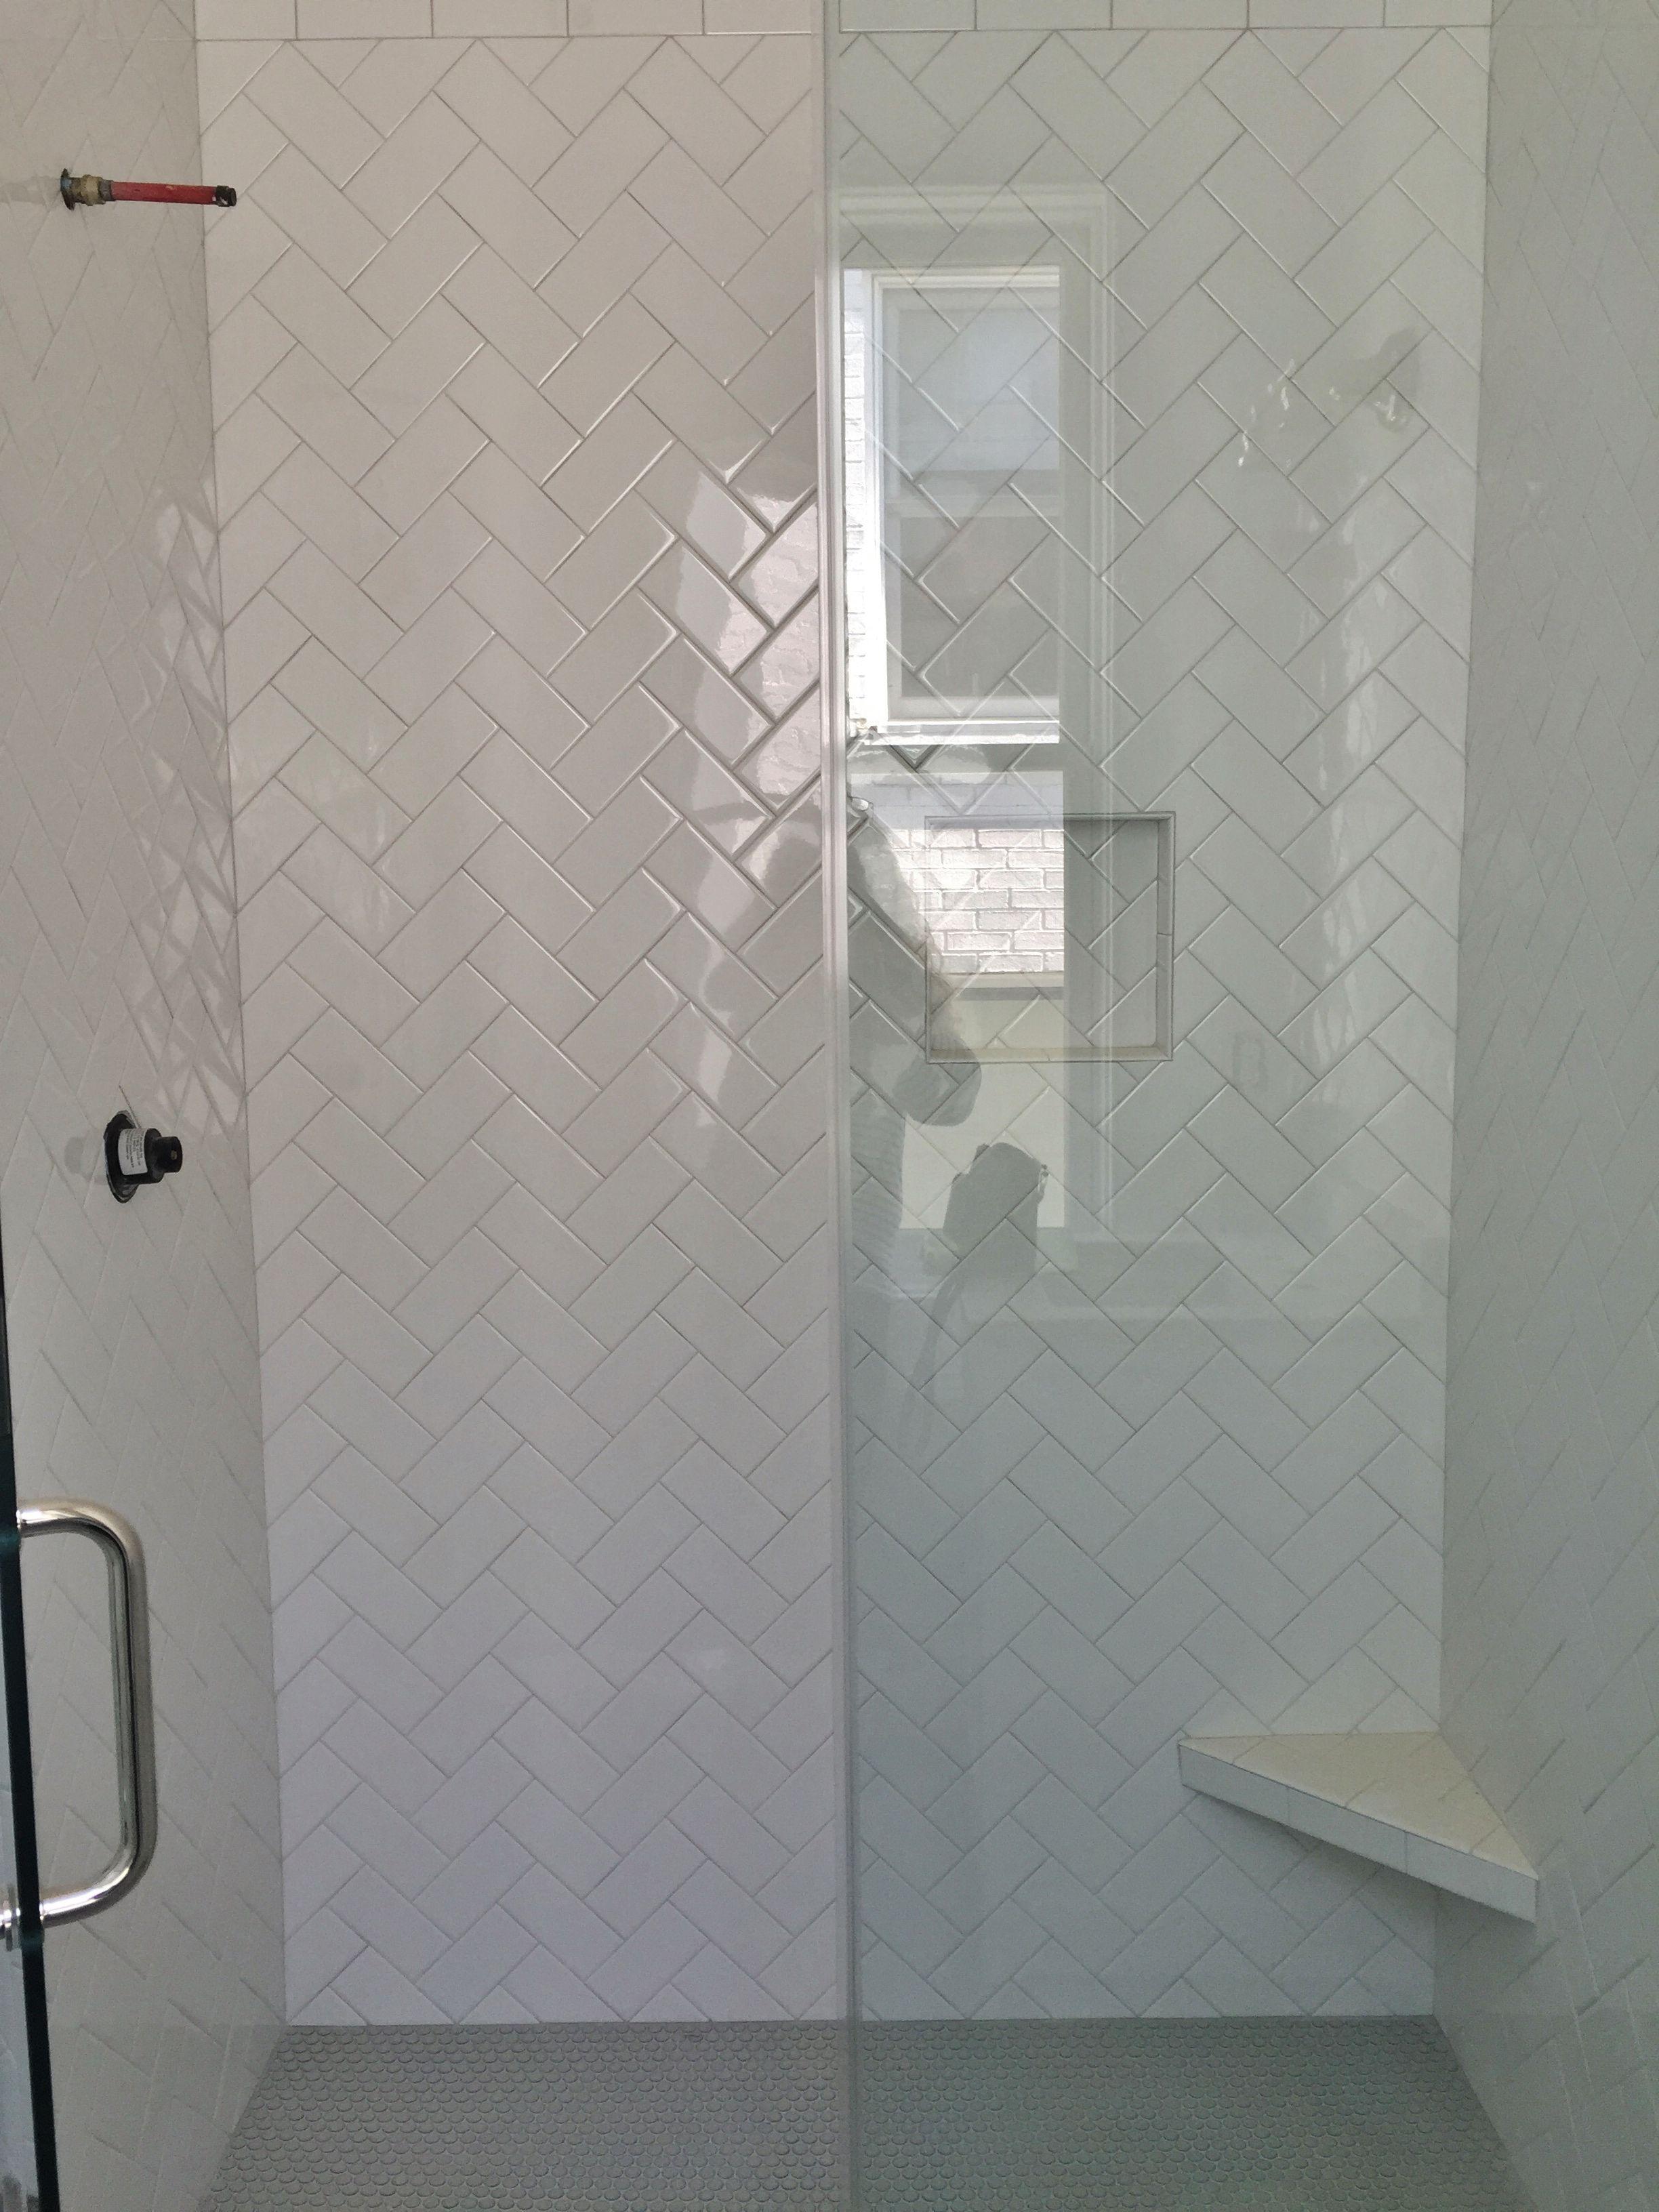 3x6 White Subway Tile Set In Herringbone Pattern Gray Penny